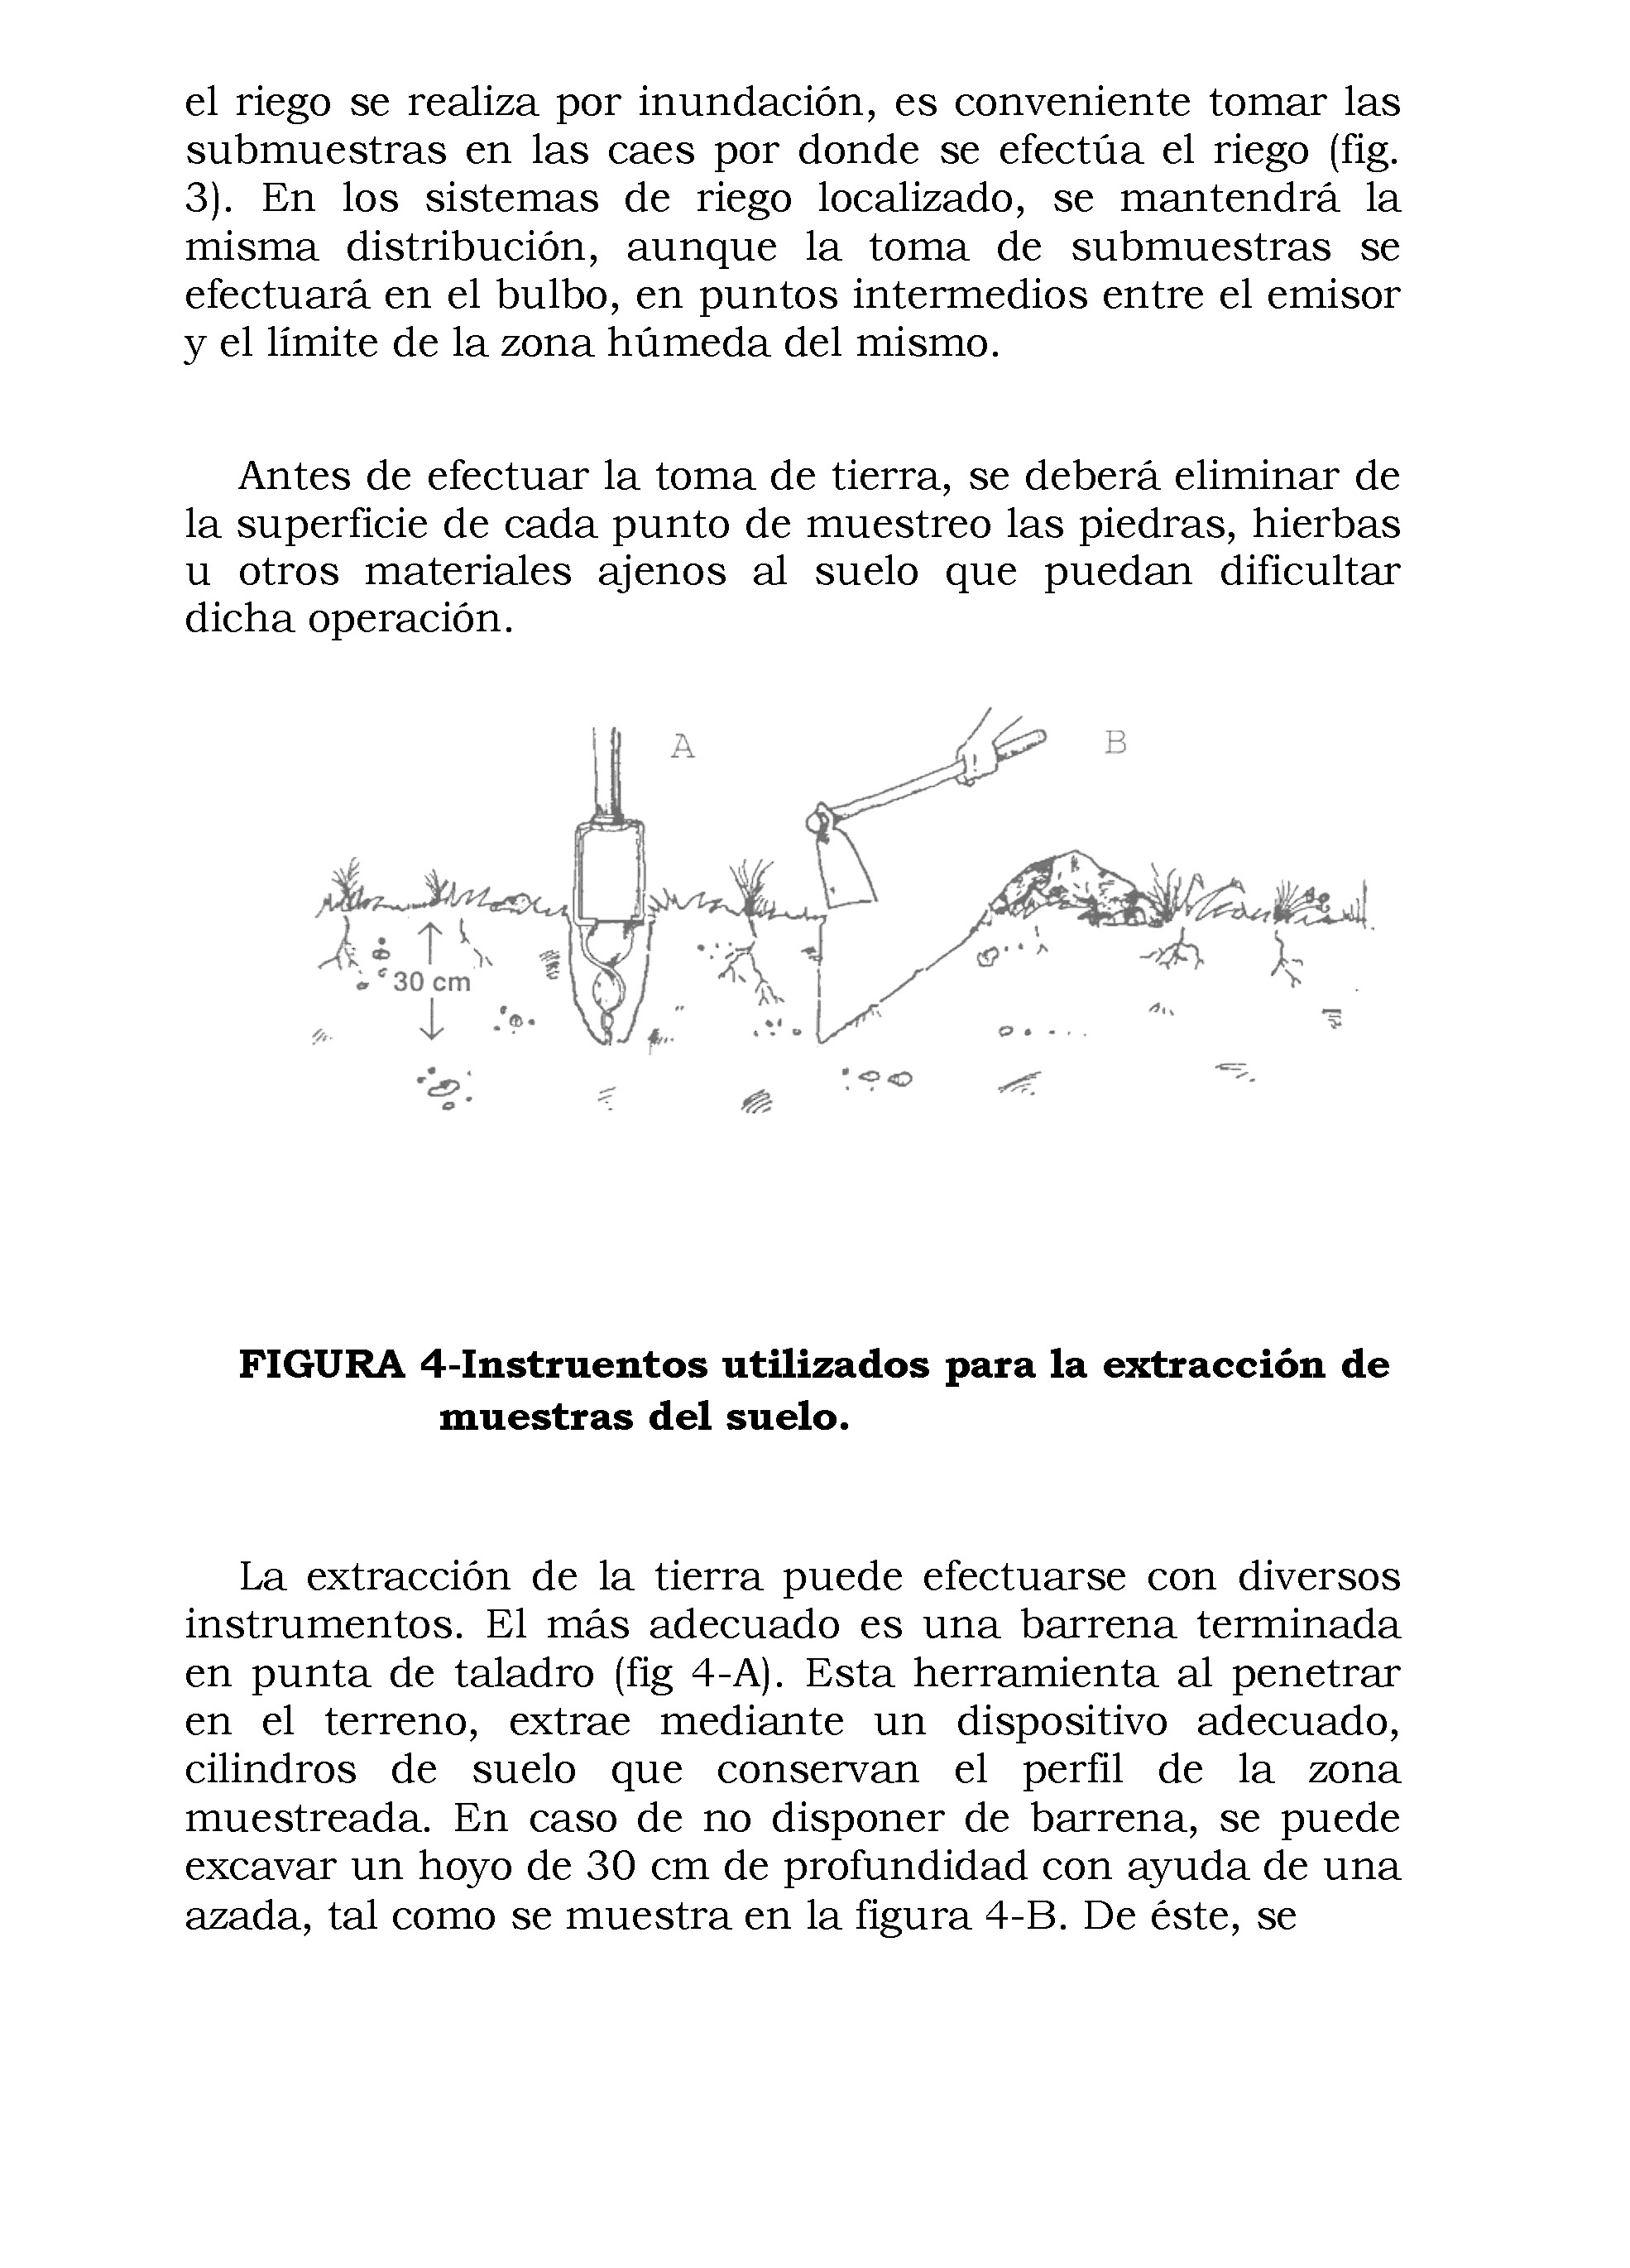 AnalisisMin_Página_21